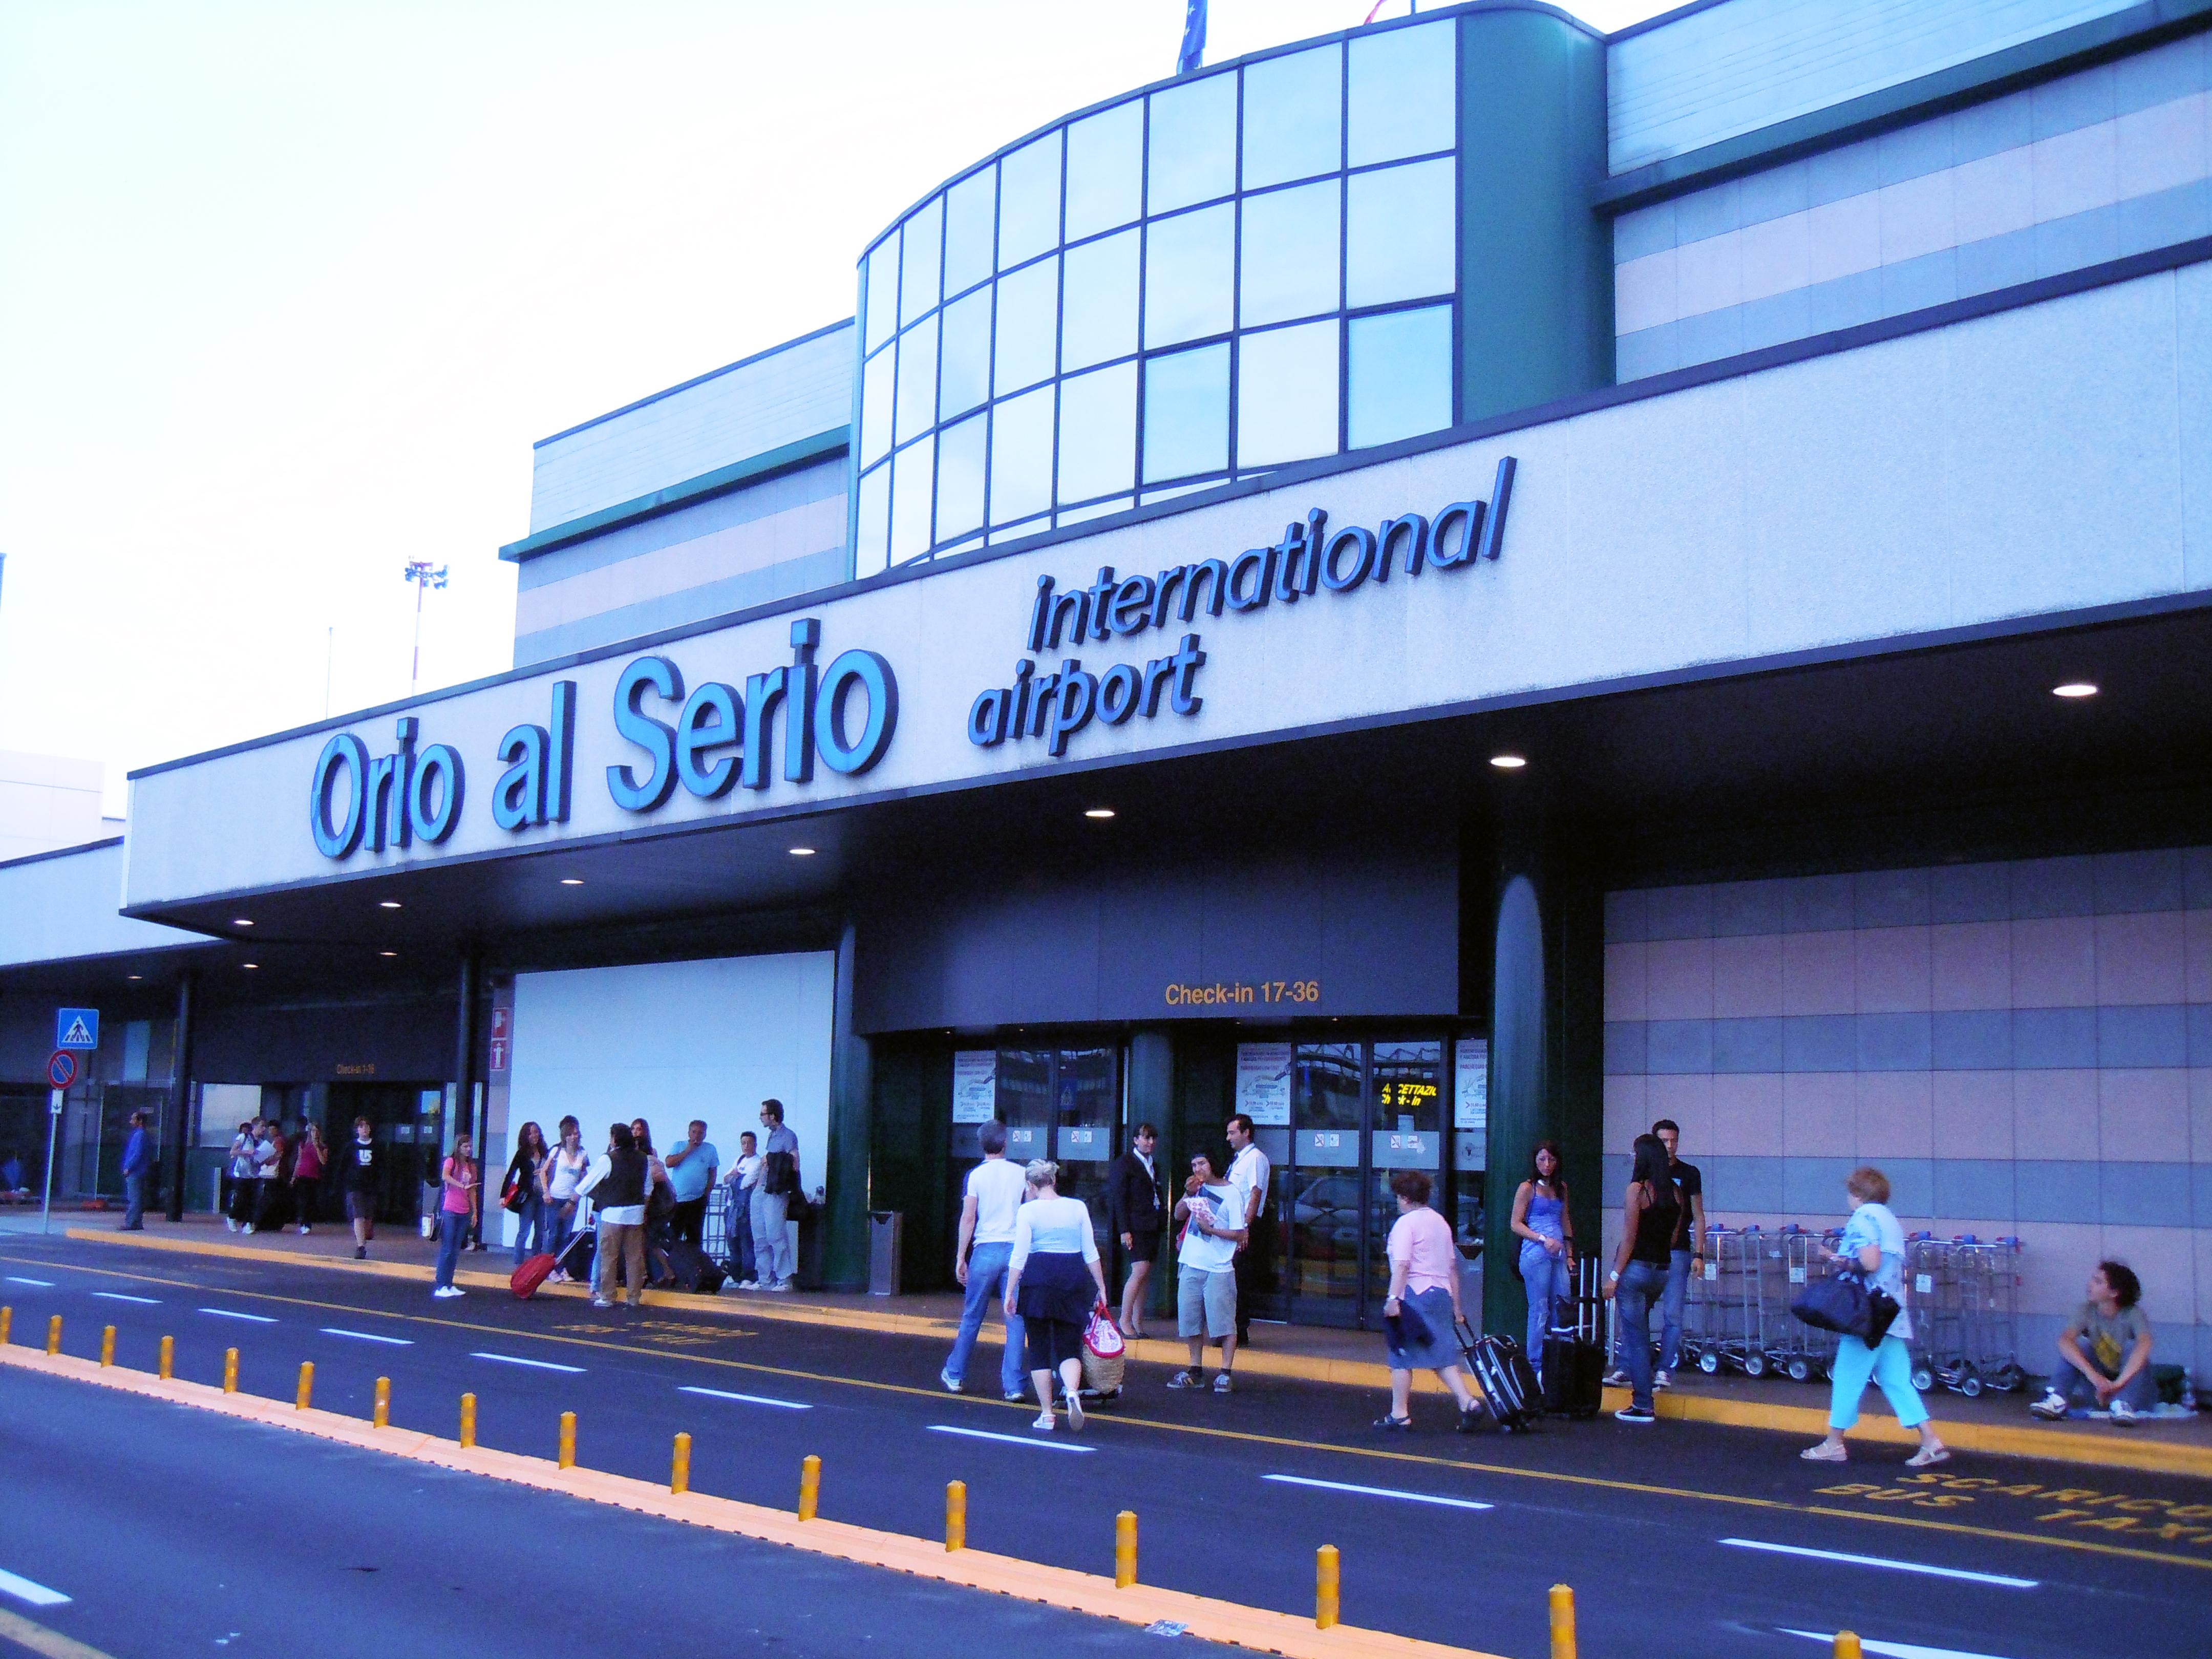 Aeroporto Orio Al Serio Bergamo : Milano orio al serio euronolo ncc